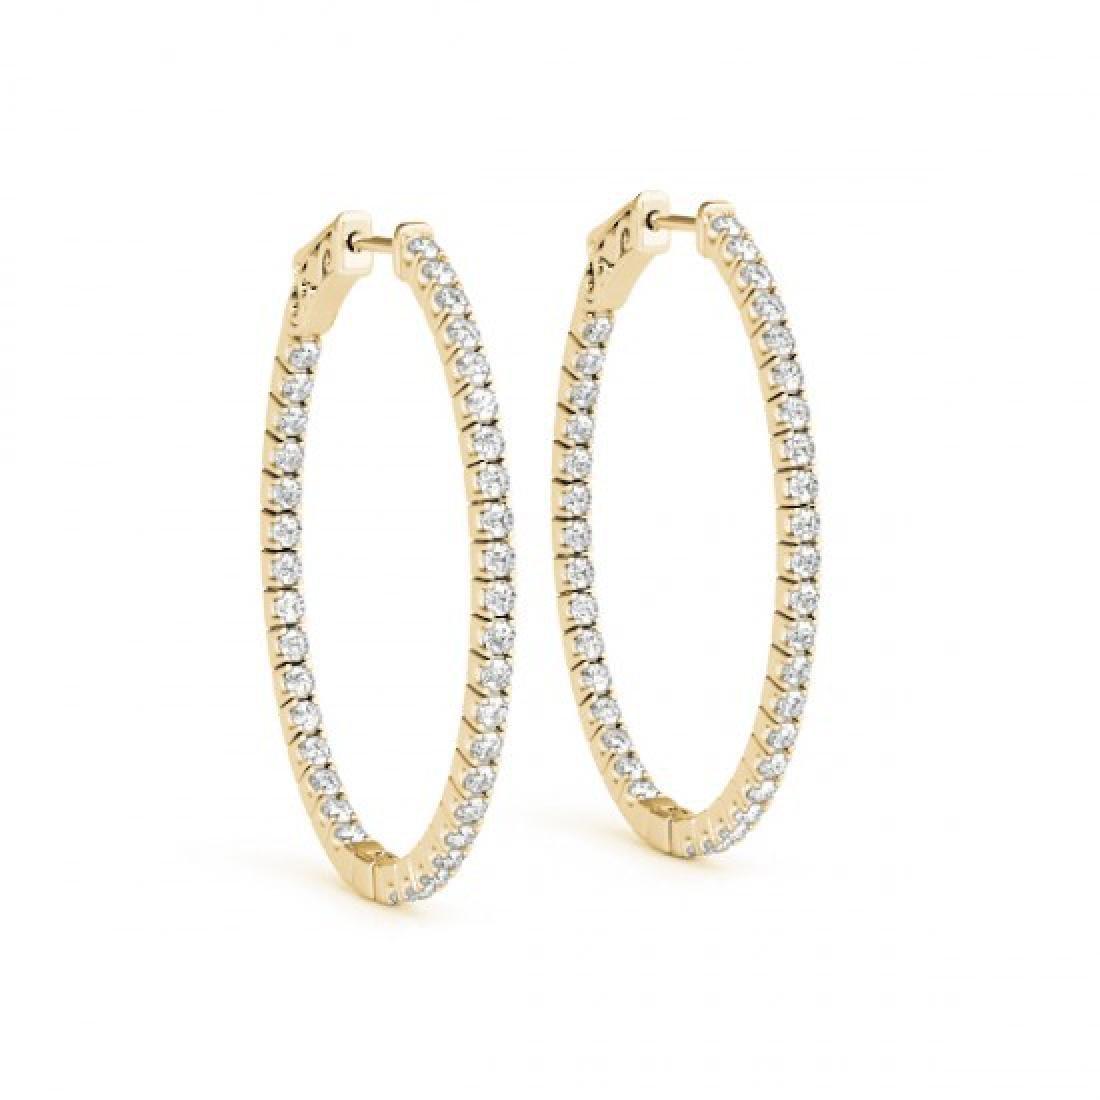 1 CTW Diamond VS/SI Certified 22 Mm Hoop Earrings 14K - 2